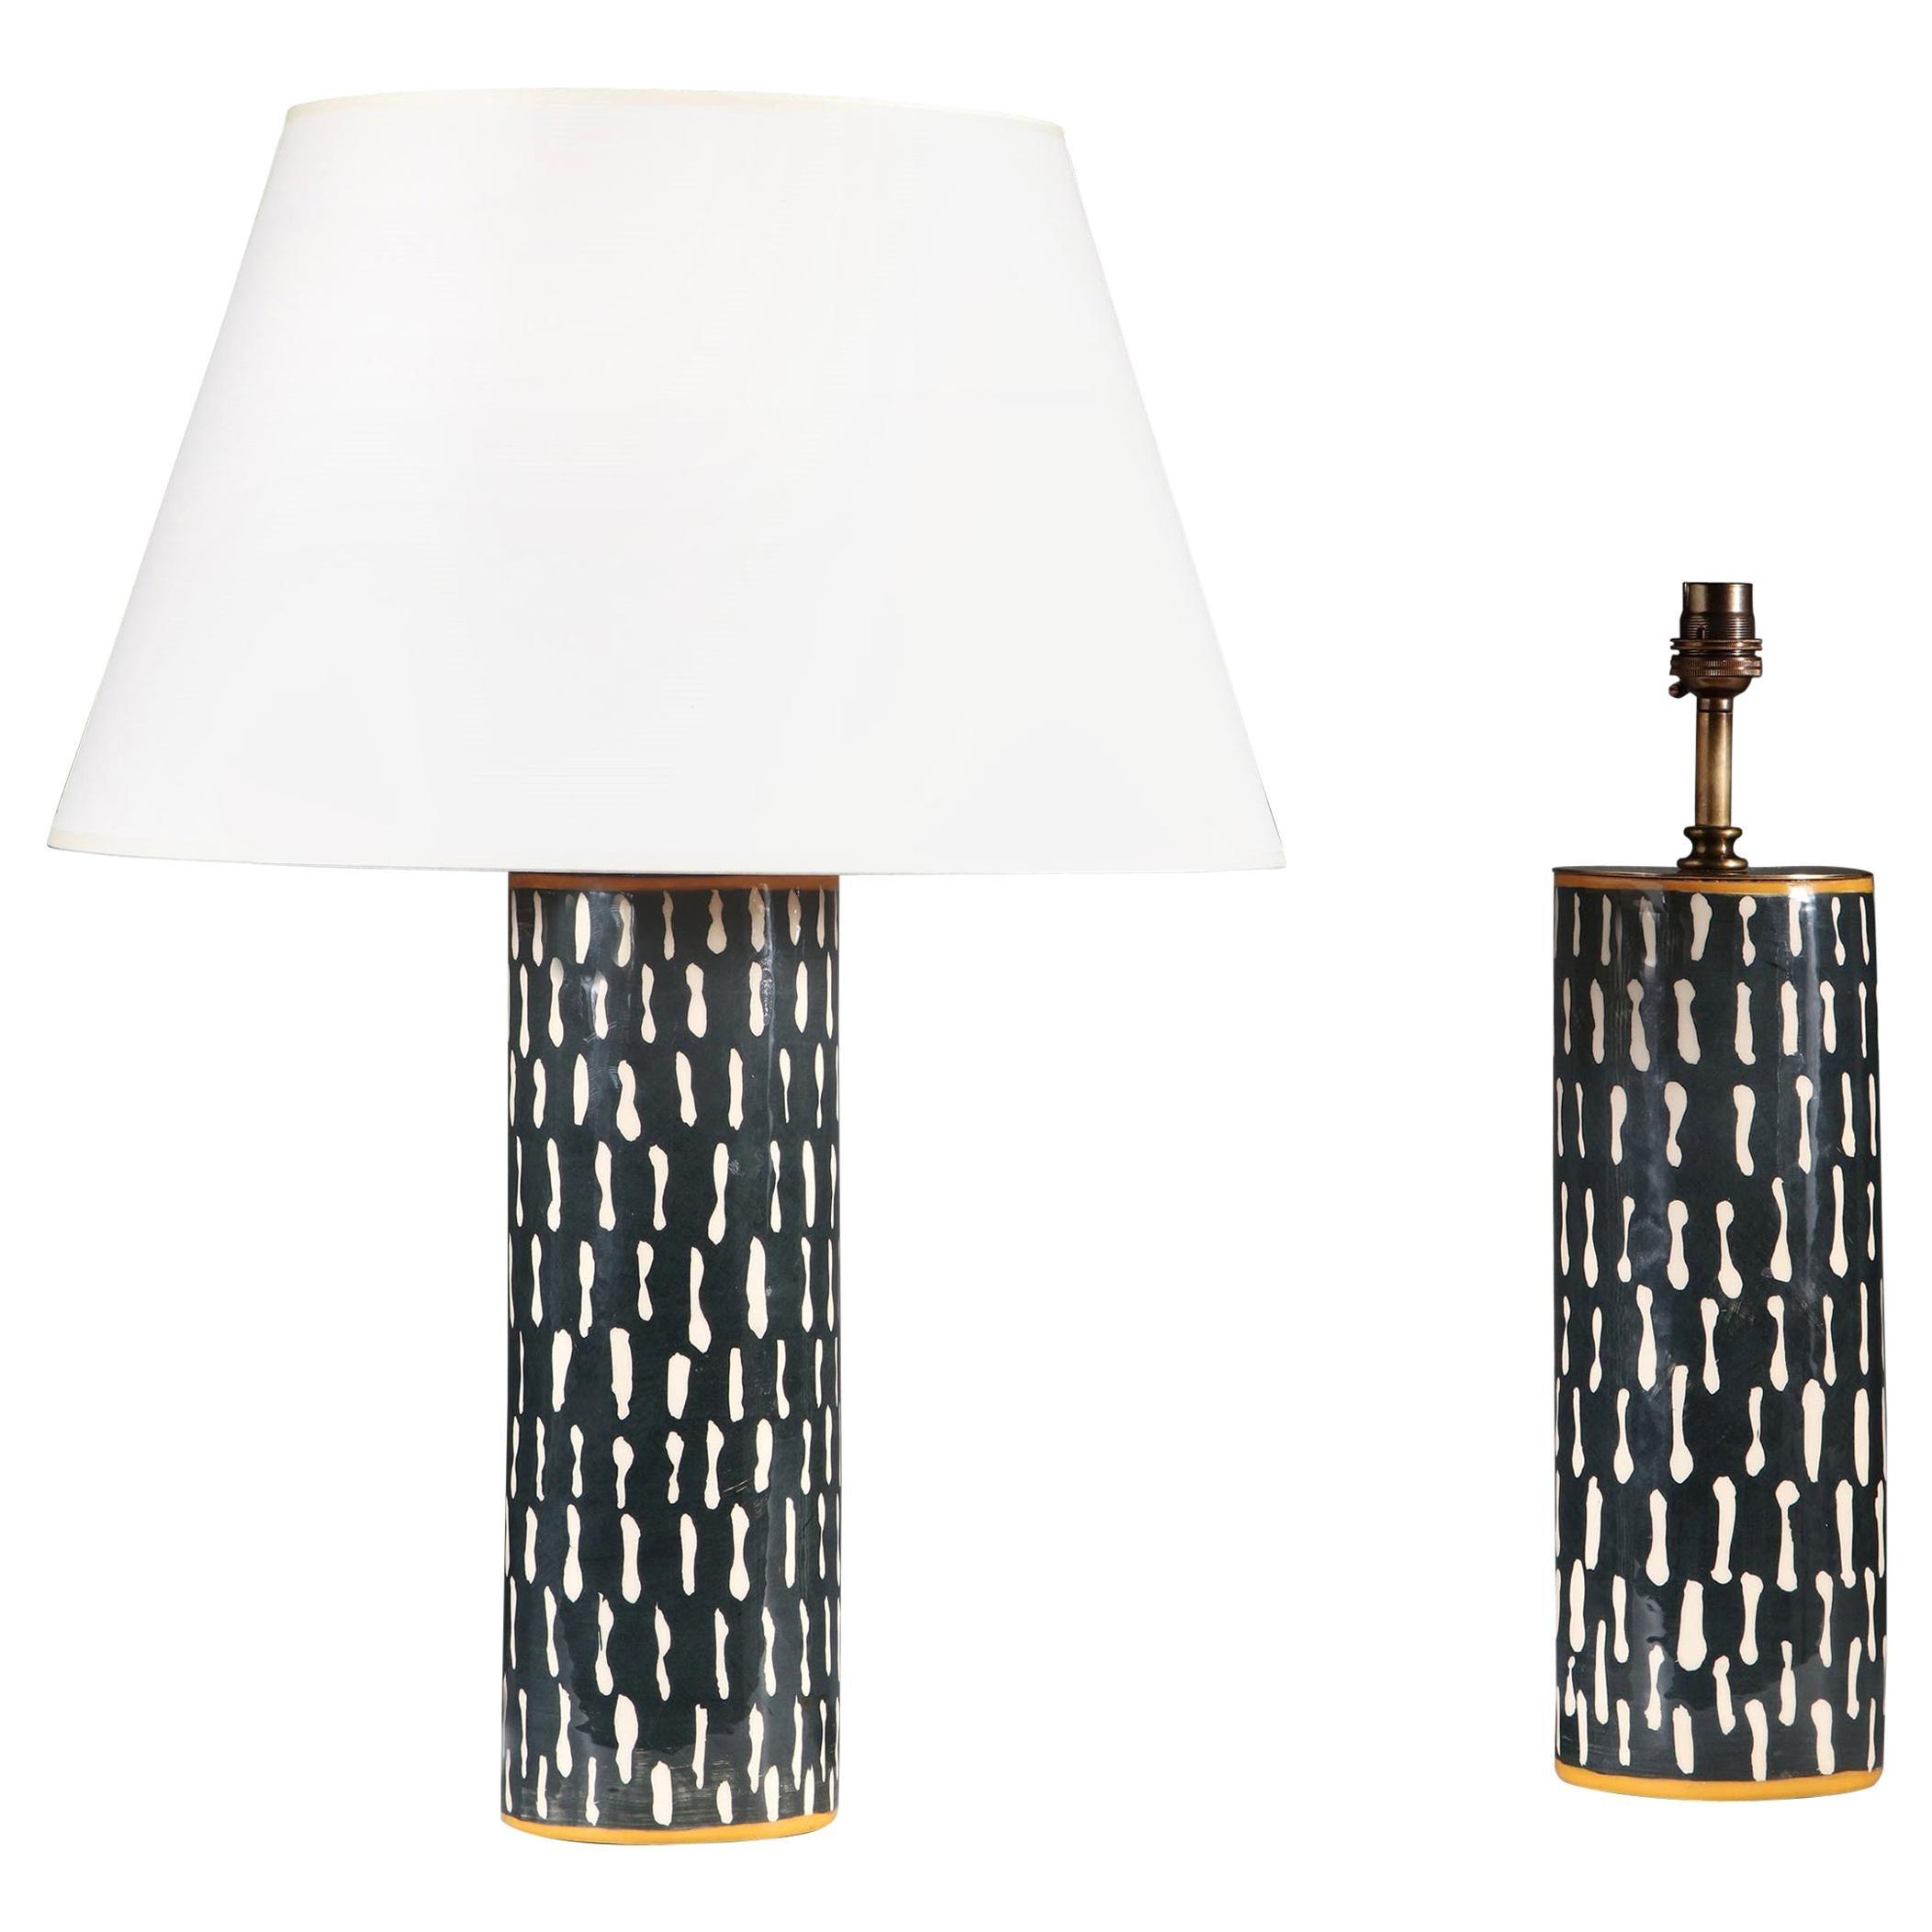 Pair of Black and White Studio Pottery Vases